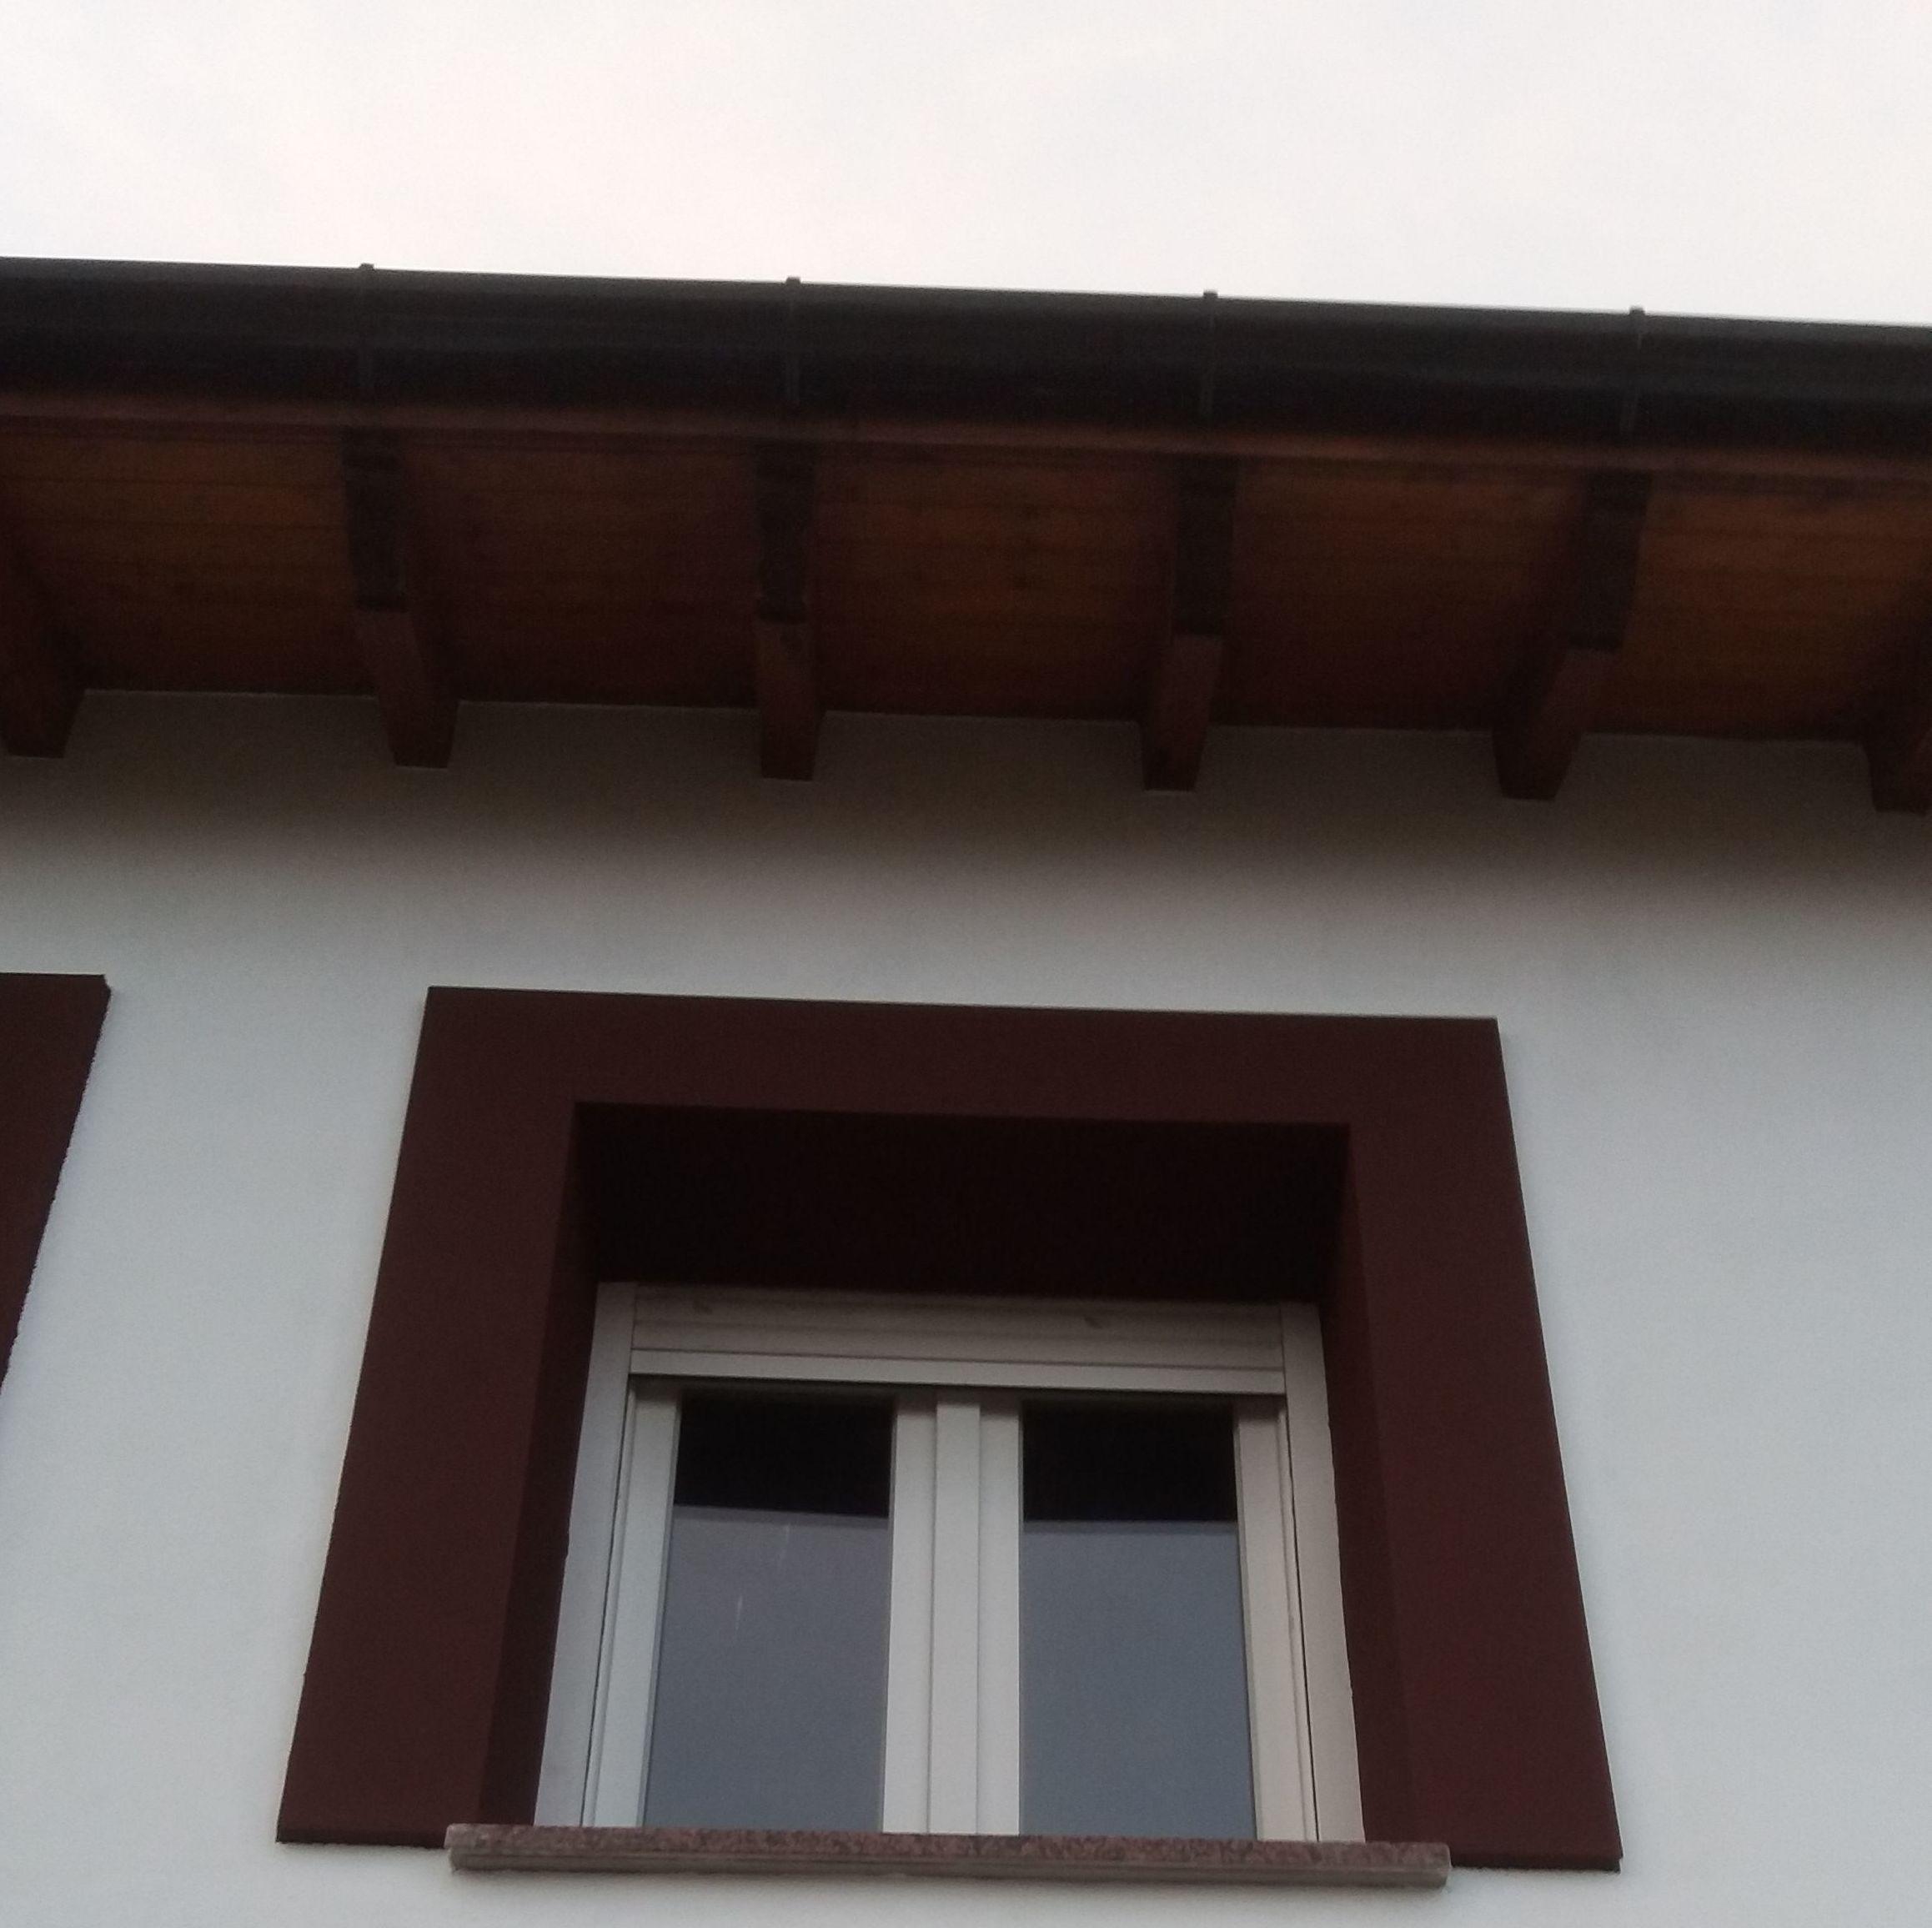 Foto 44 de Empresa de reformas en Oviedo | Asturcore